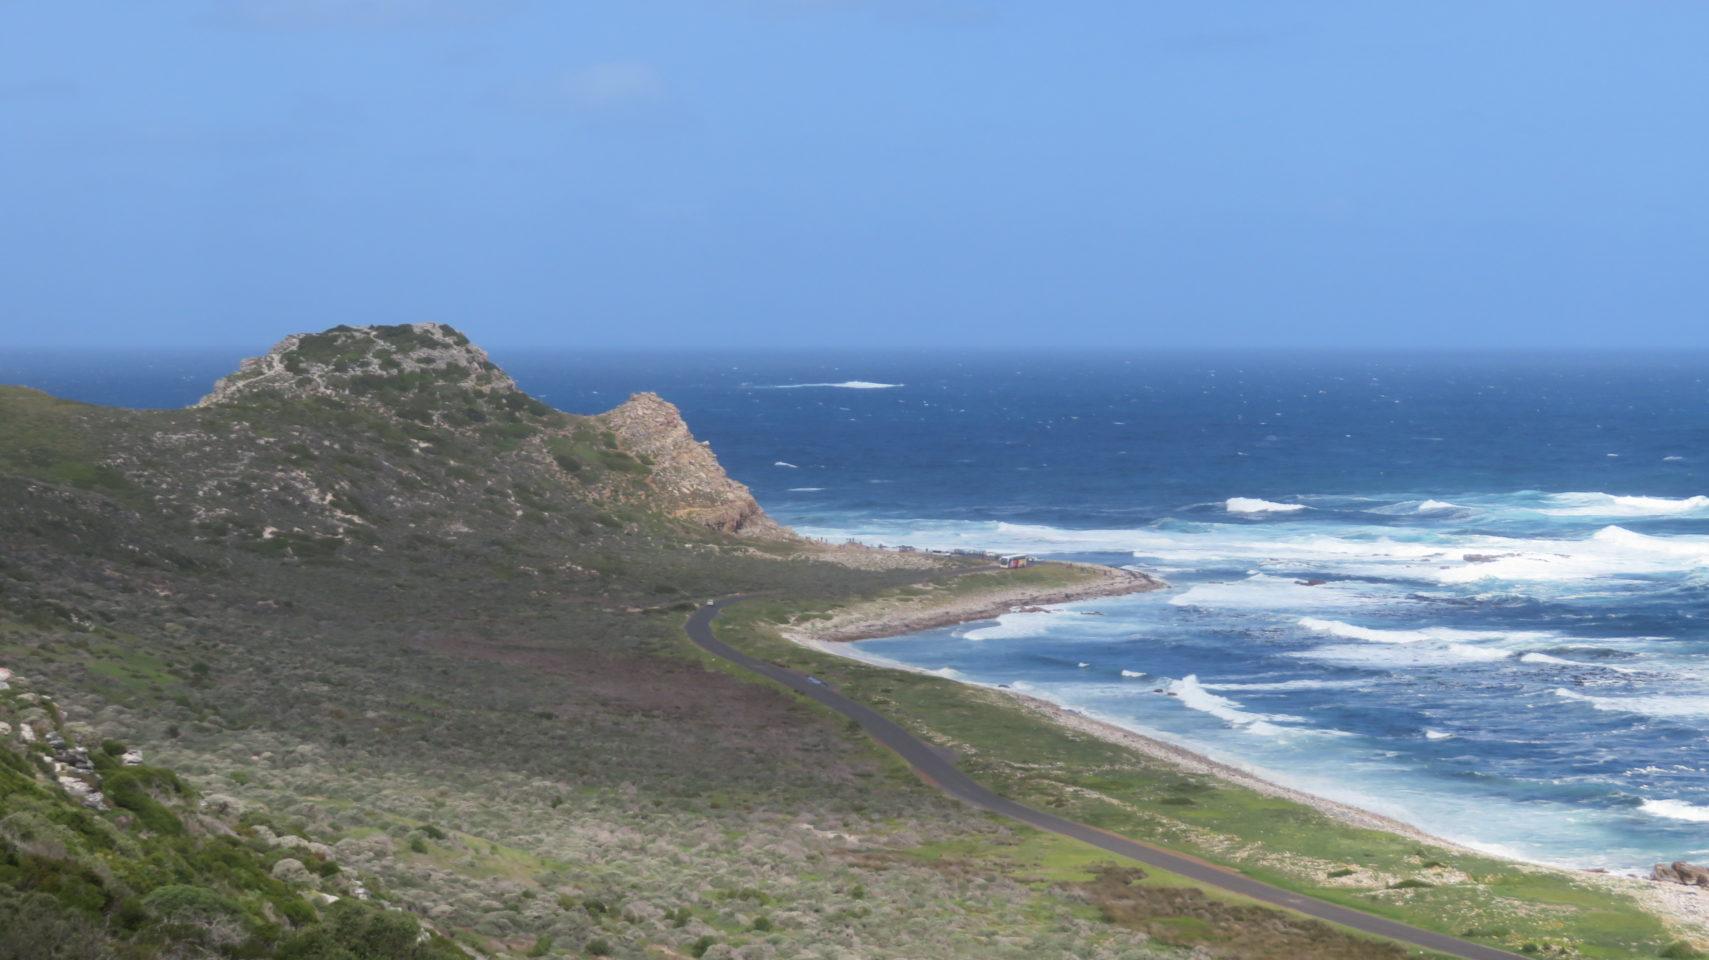 The renowned Cape of Good Hope ~ Cape Peninsula